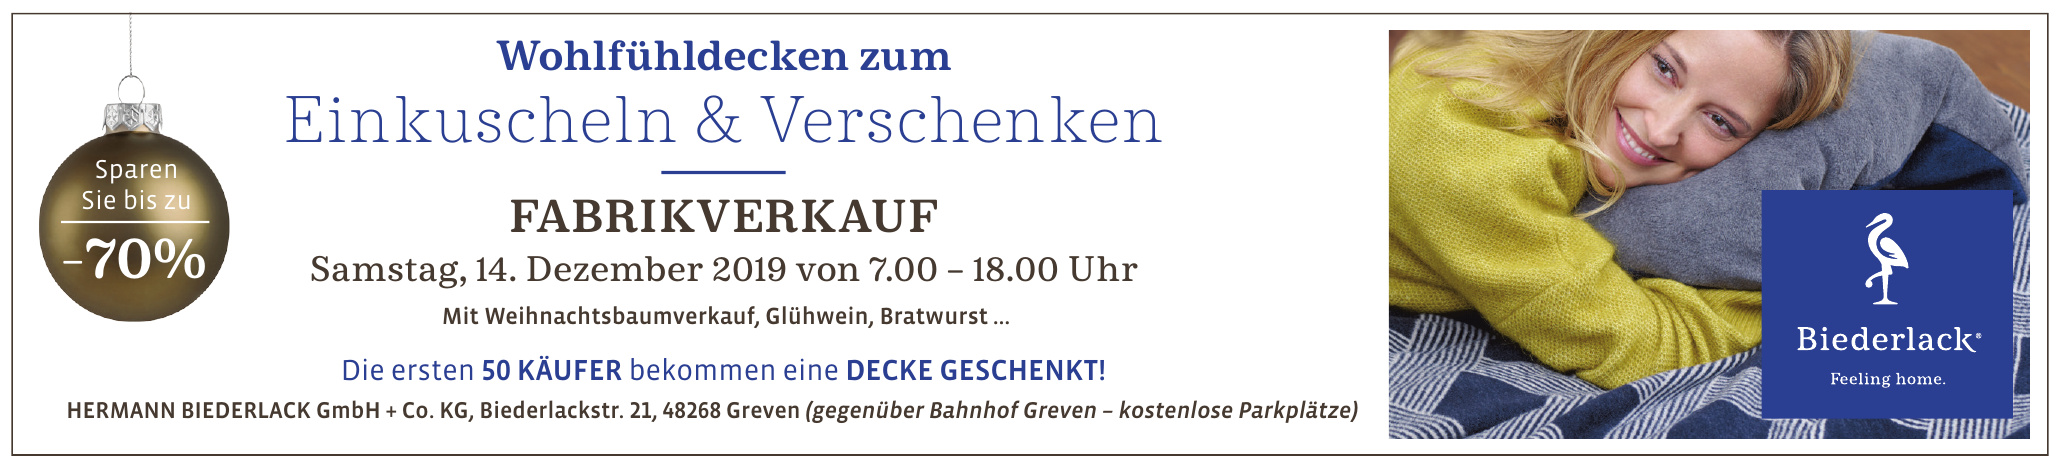 Hermann Biederlack GmbH + Co. KG